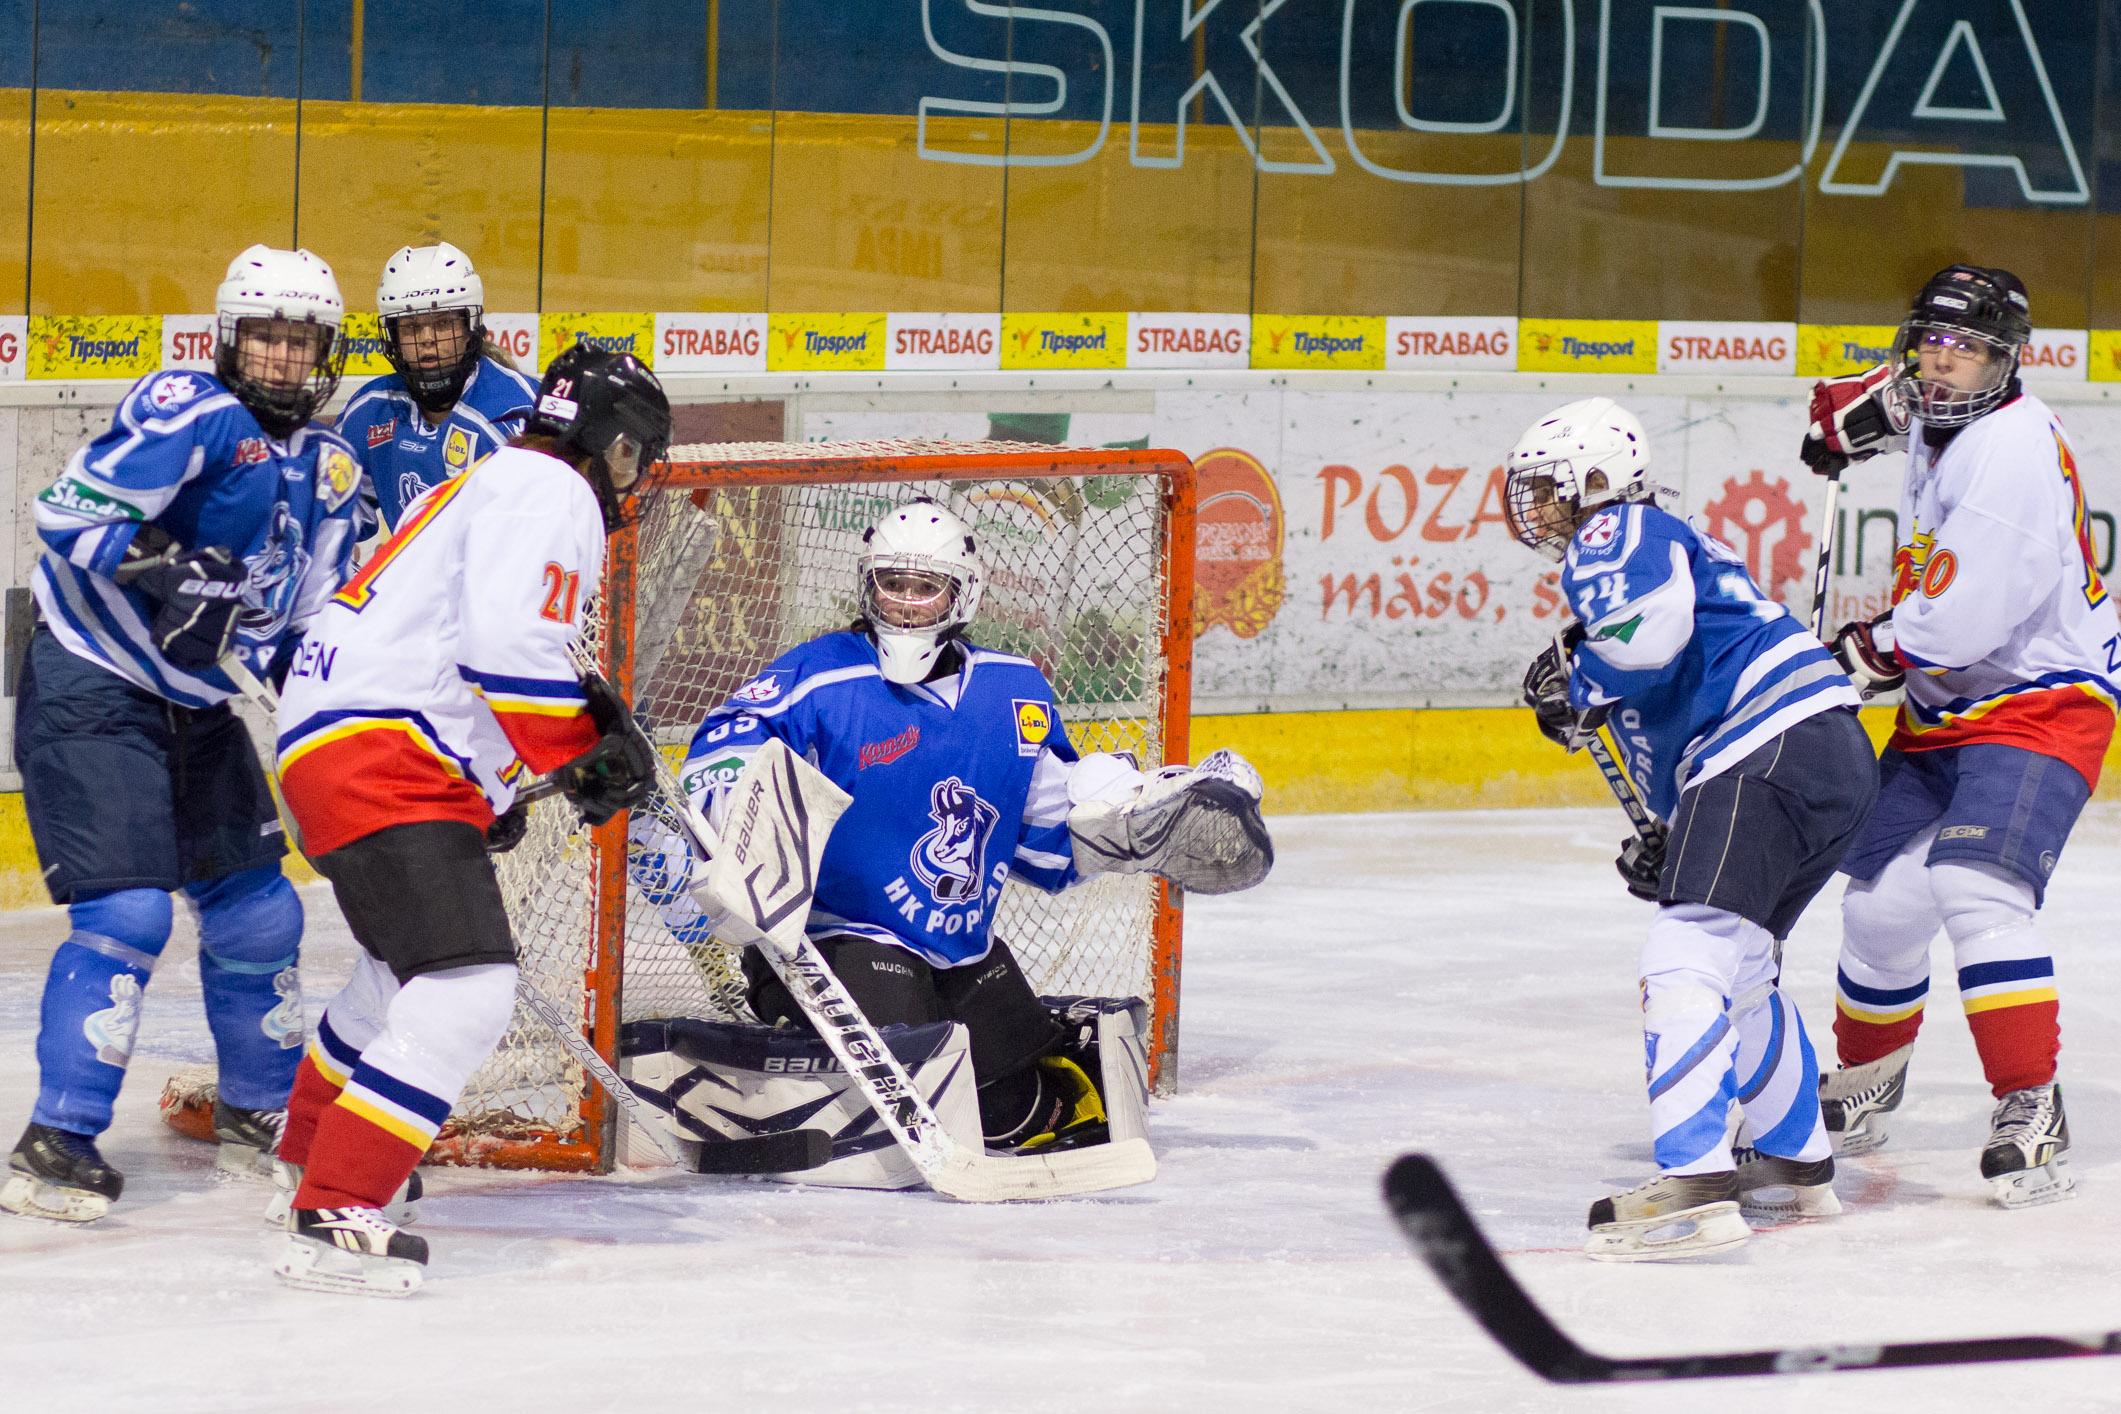 zhkm-zvolen-hk-poprad-2014-hokej-5